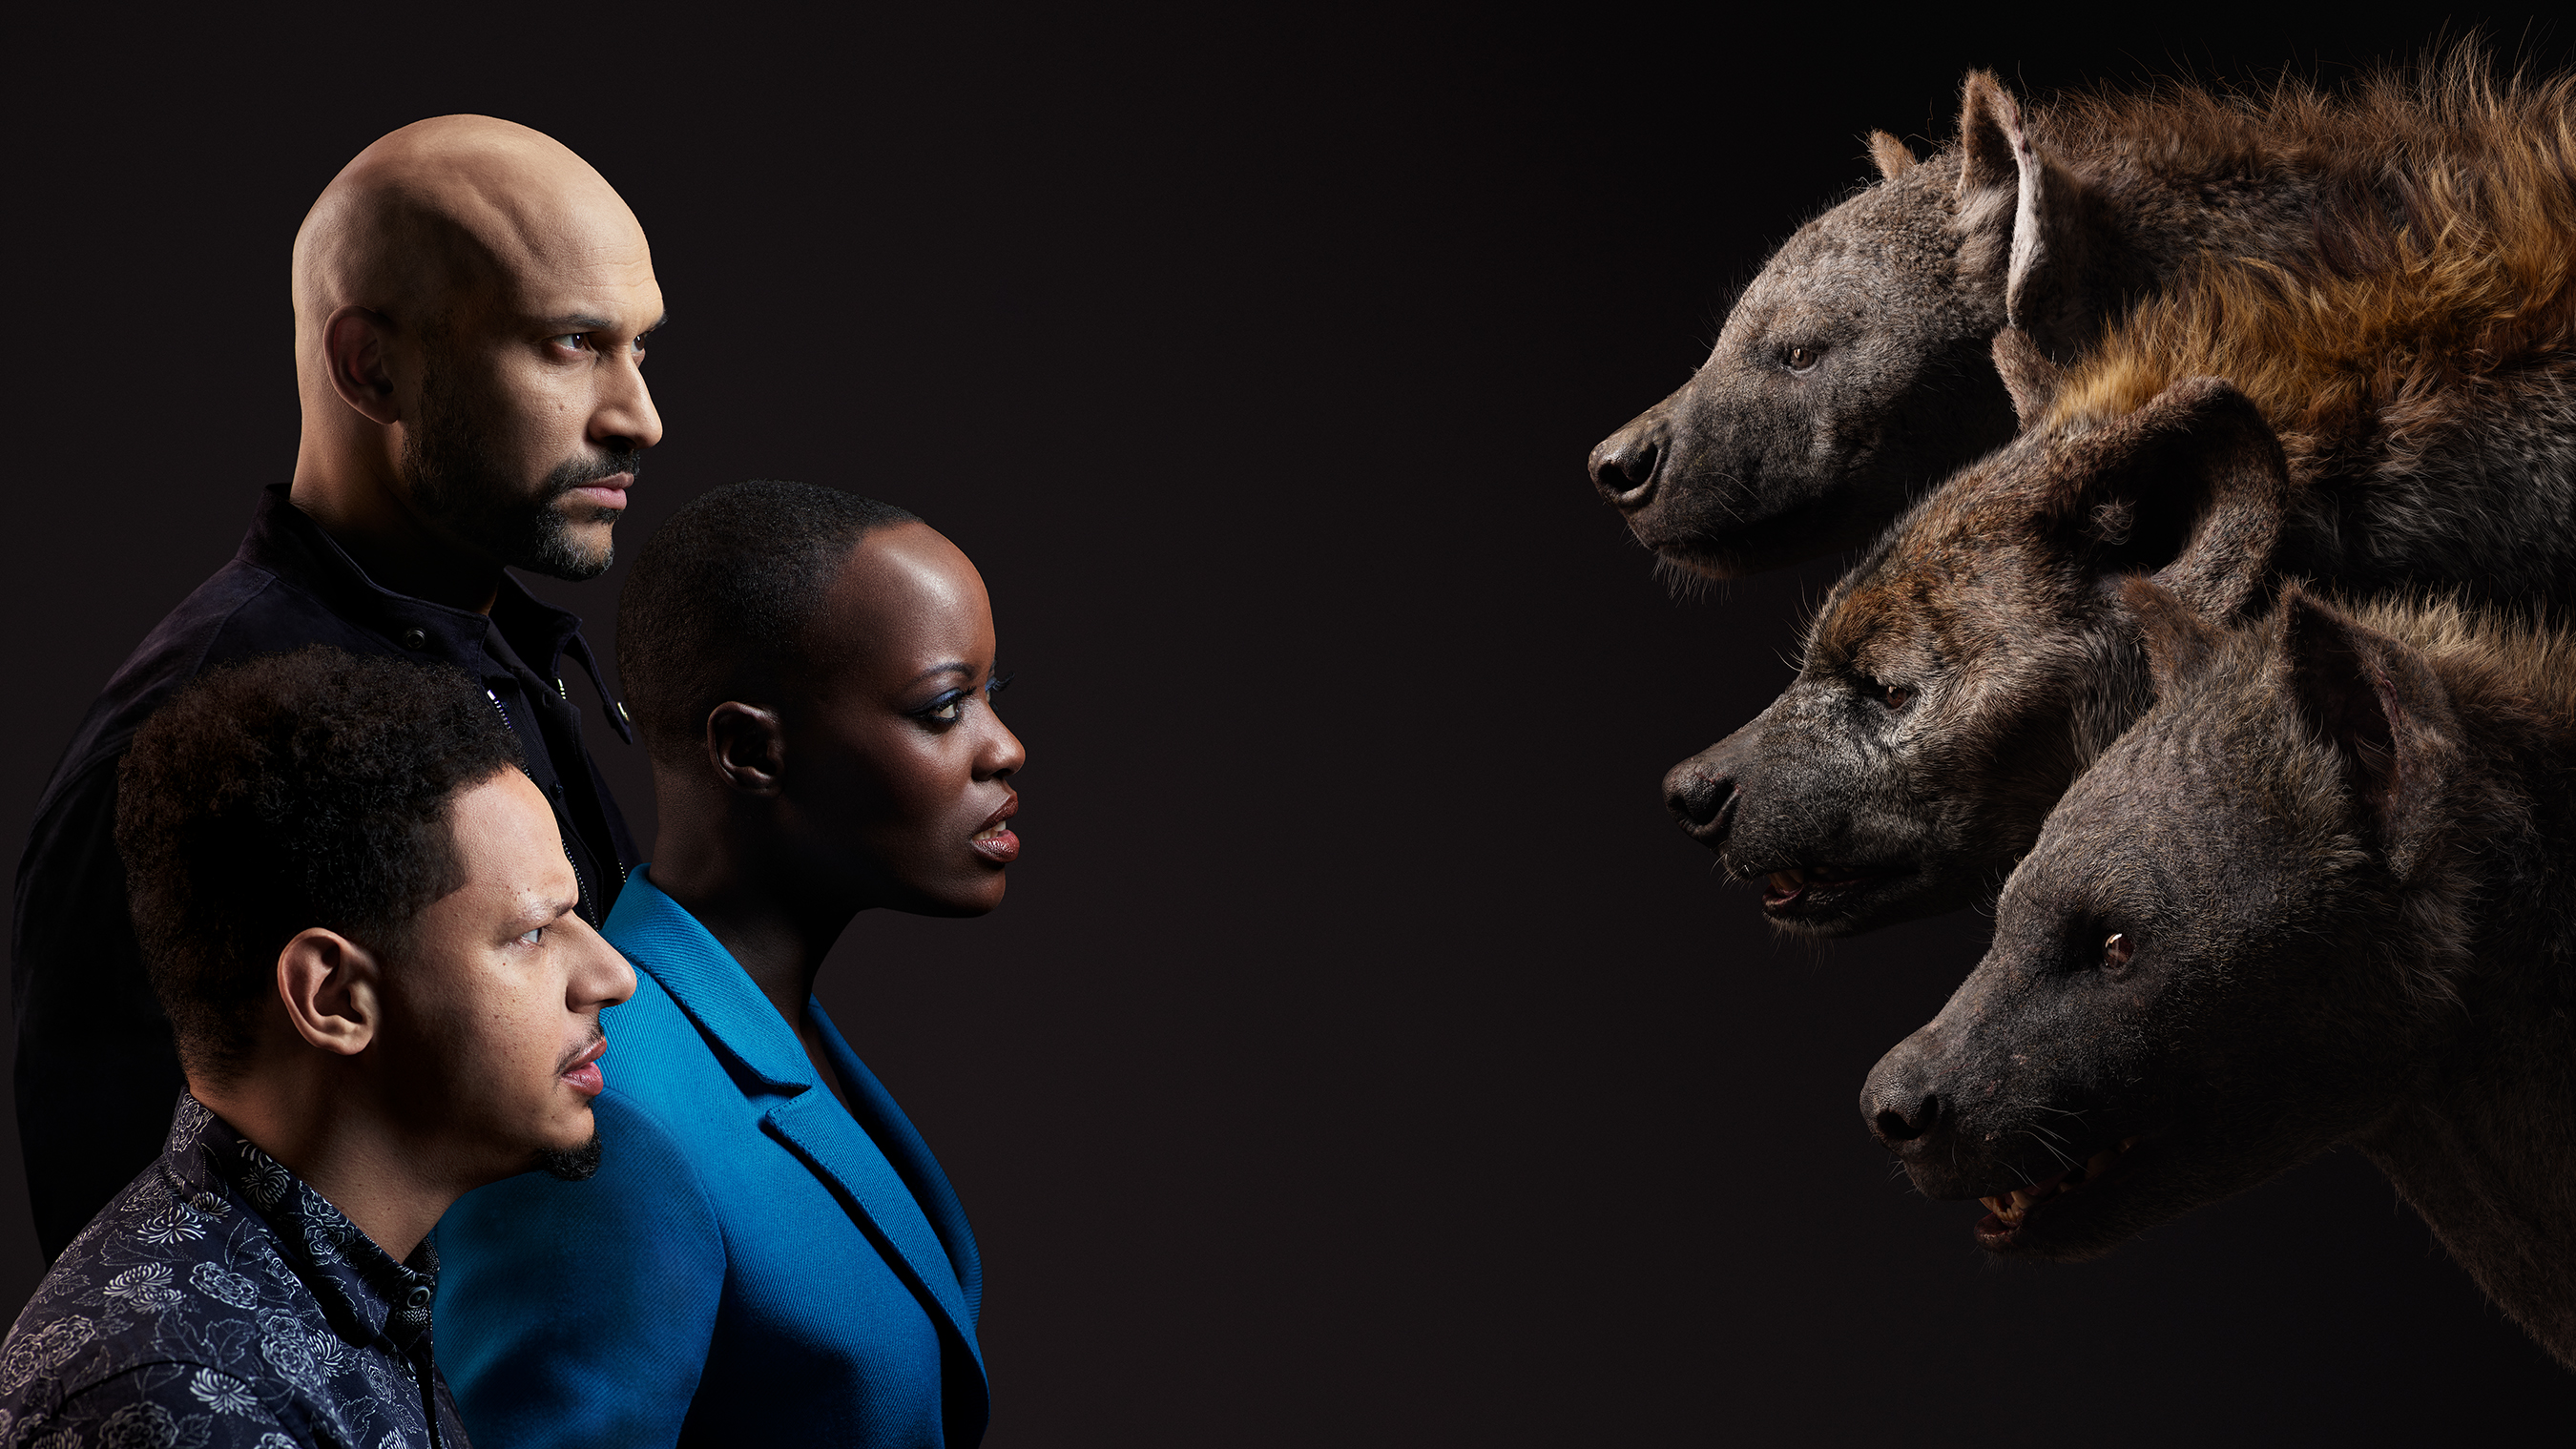 THE LION KING, Keegan-Michael Key, Florence Kasumba, Eric André